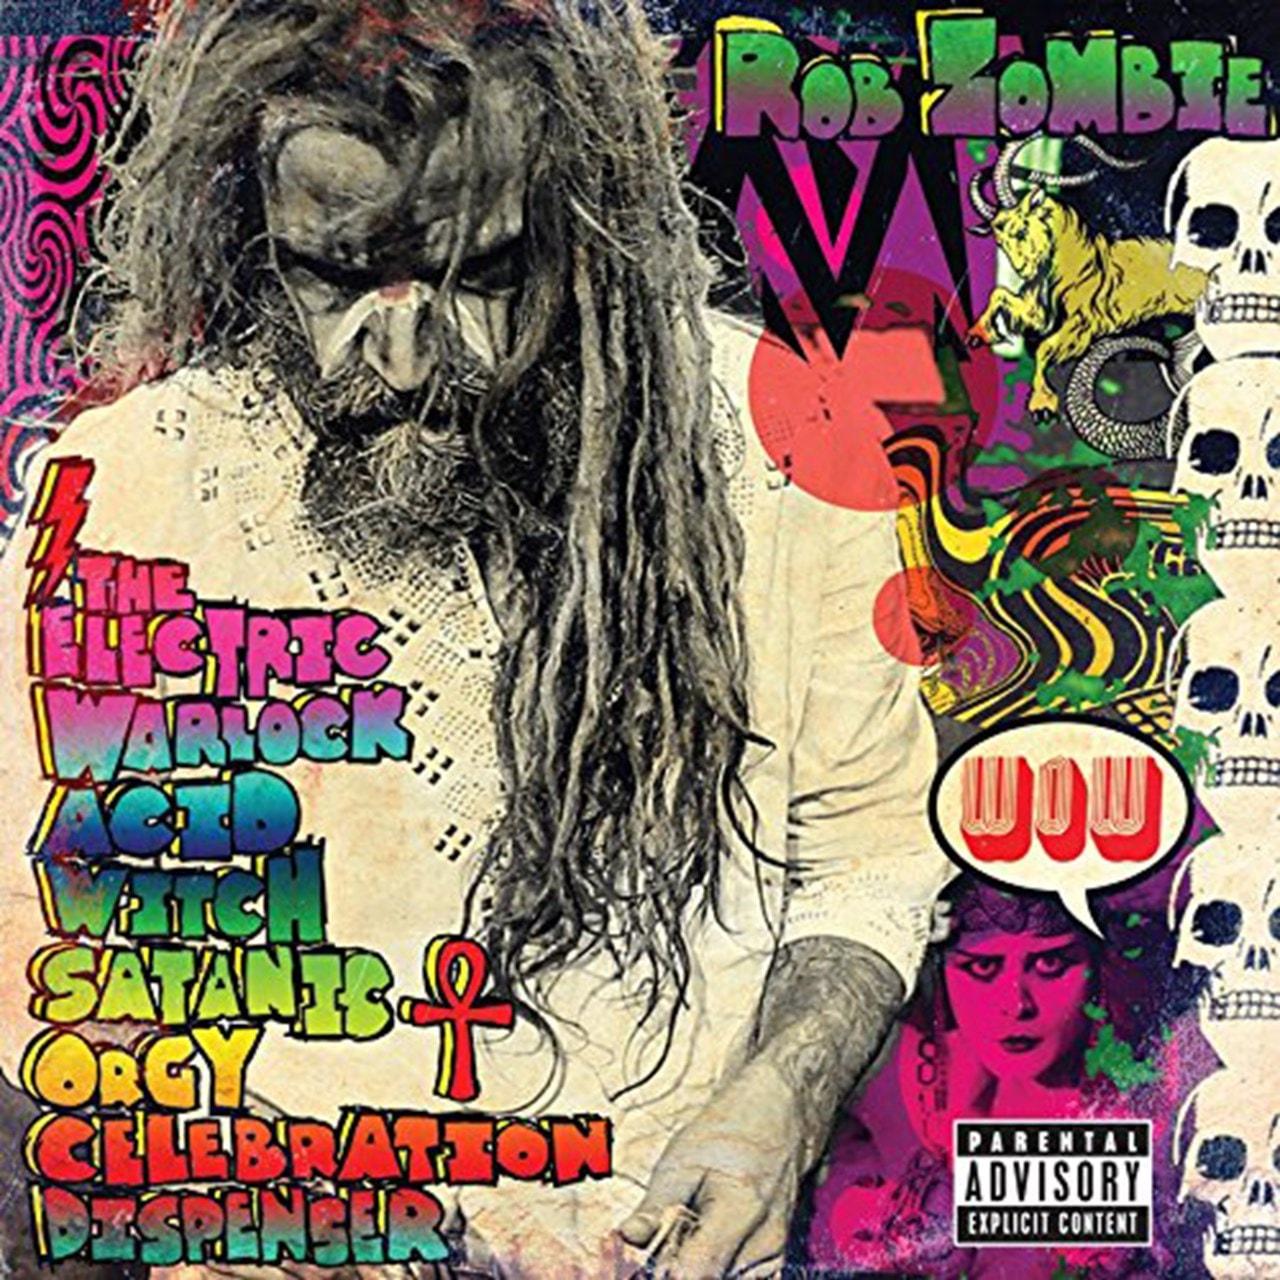 The Electric Warlock Acid Witch Satanic Orgy Celebration - 1